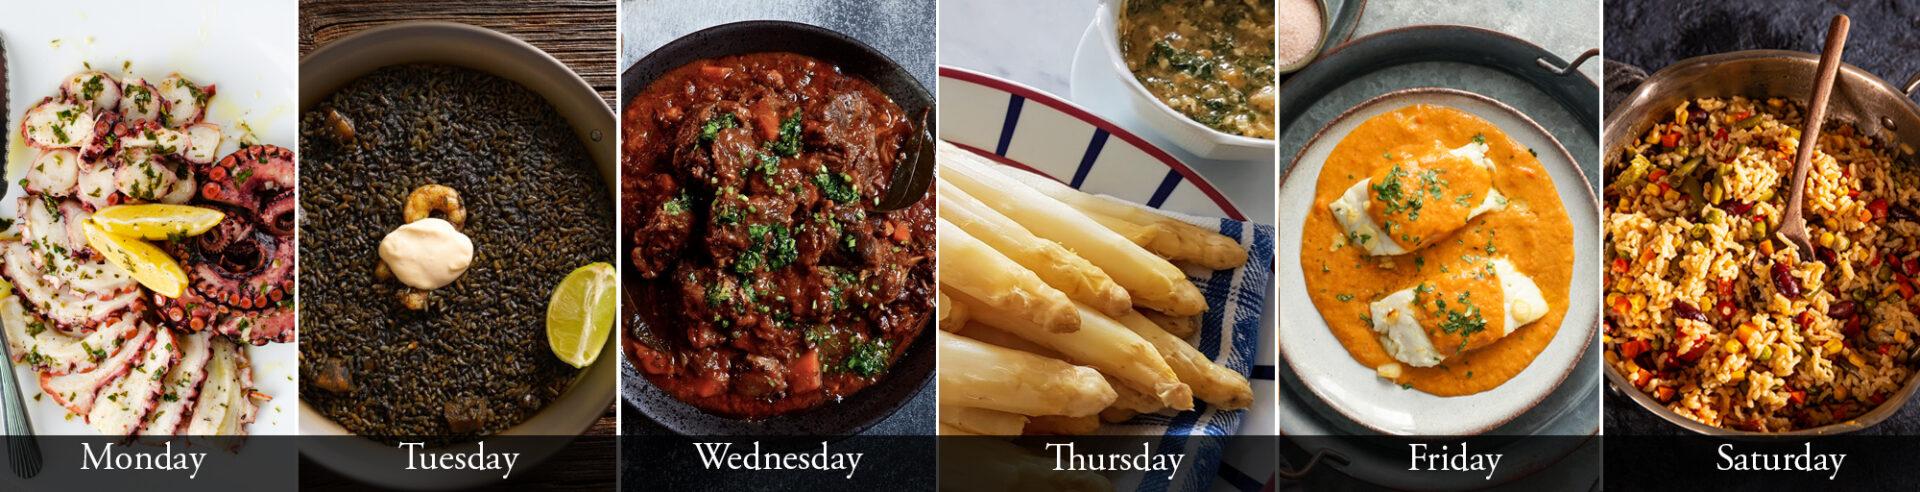 Healthy Mediterranean meal plan